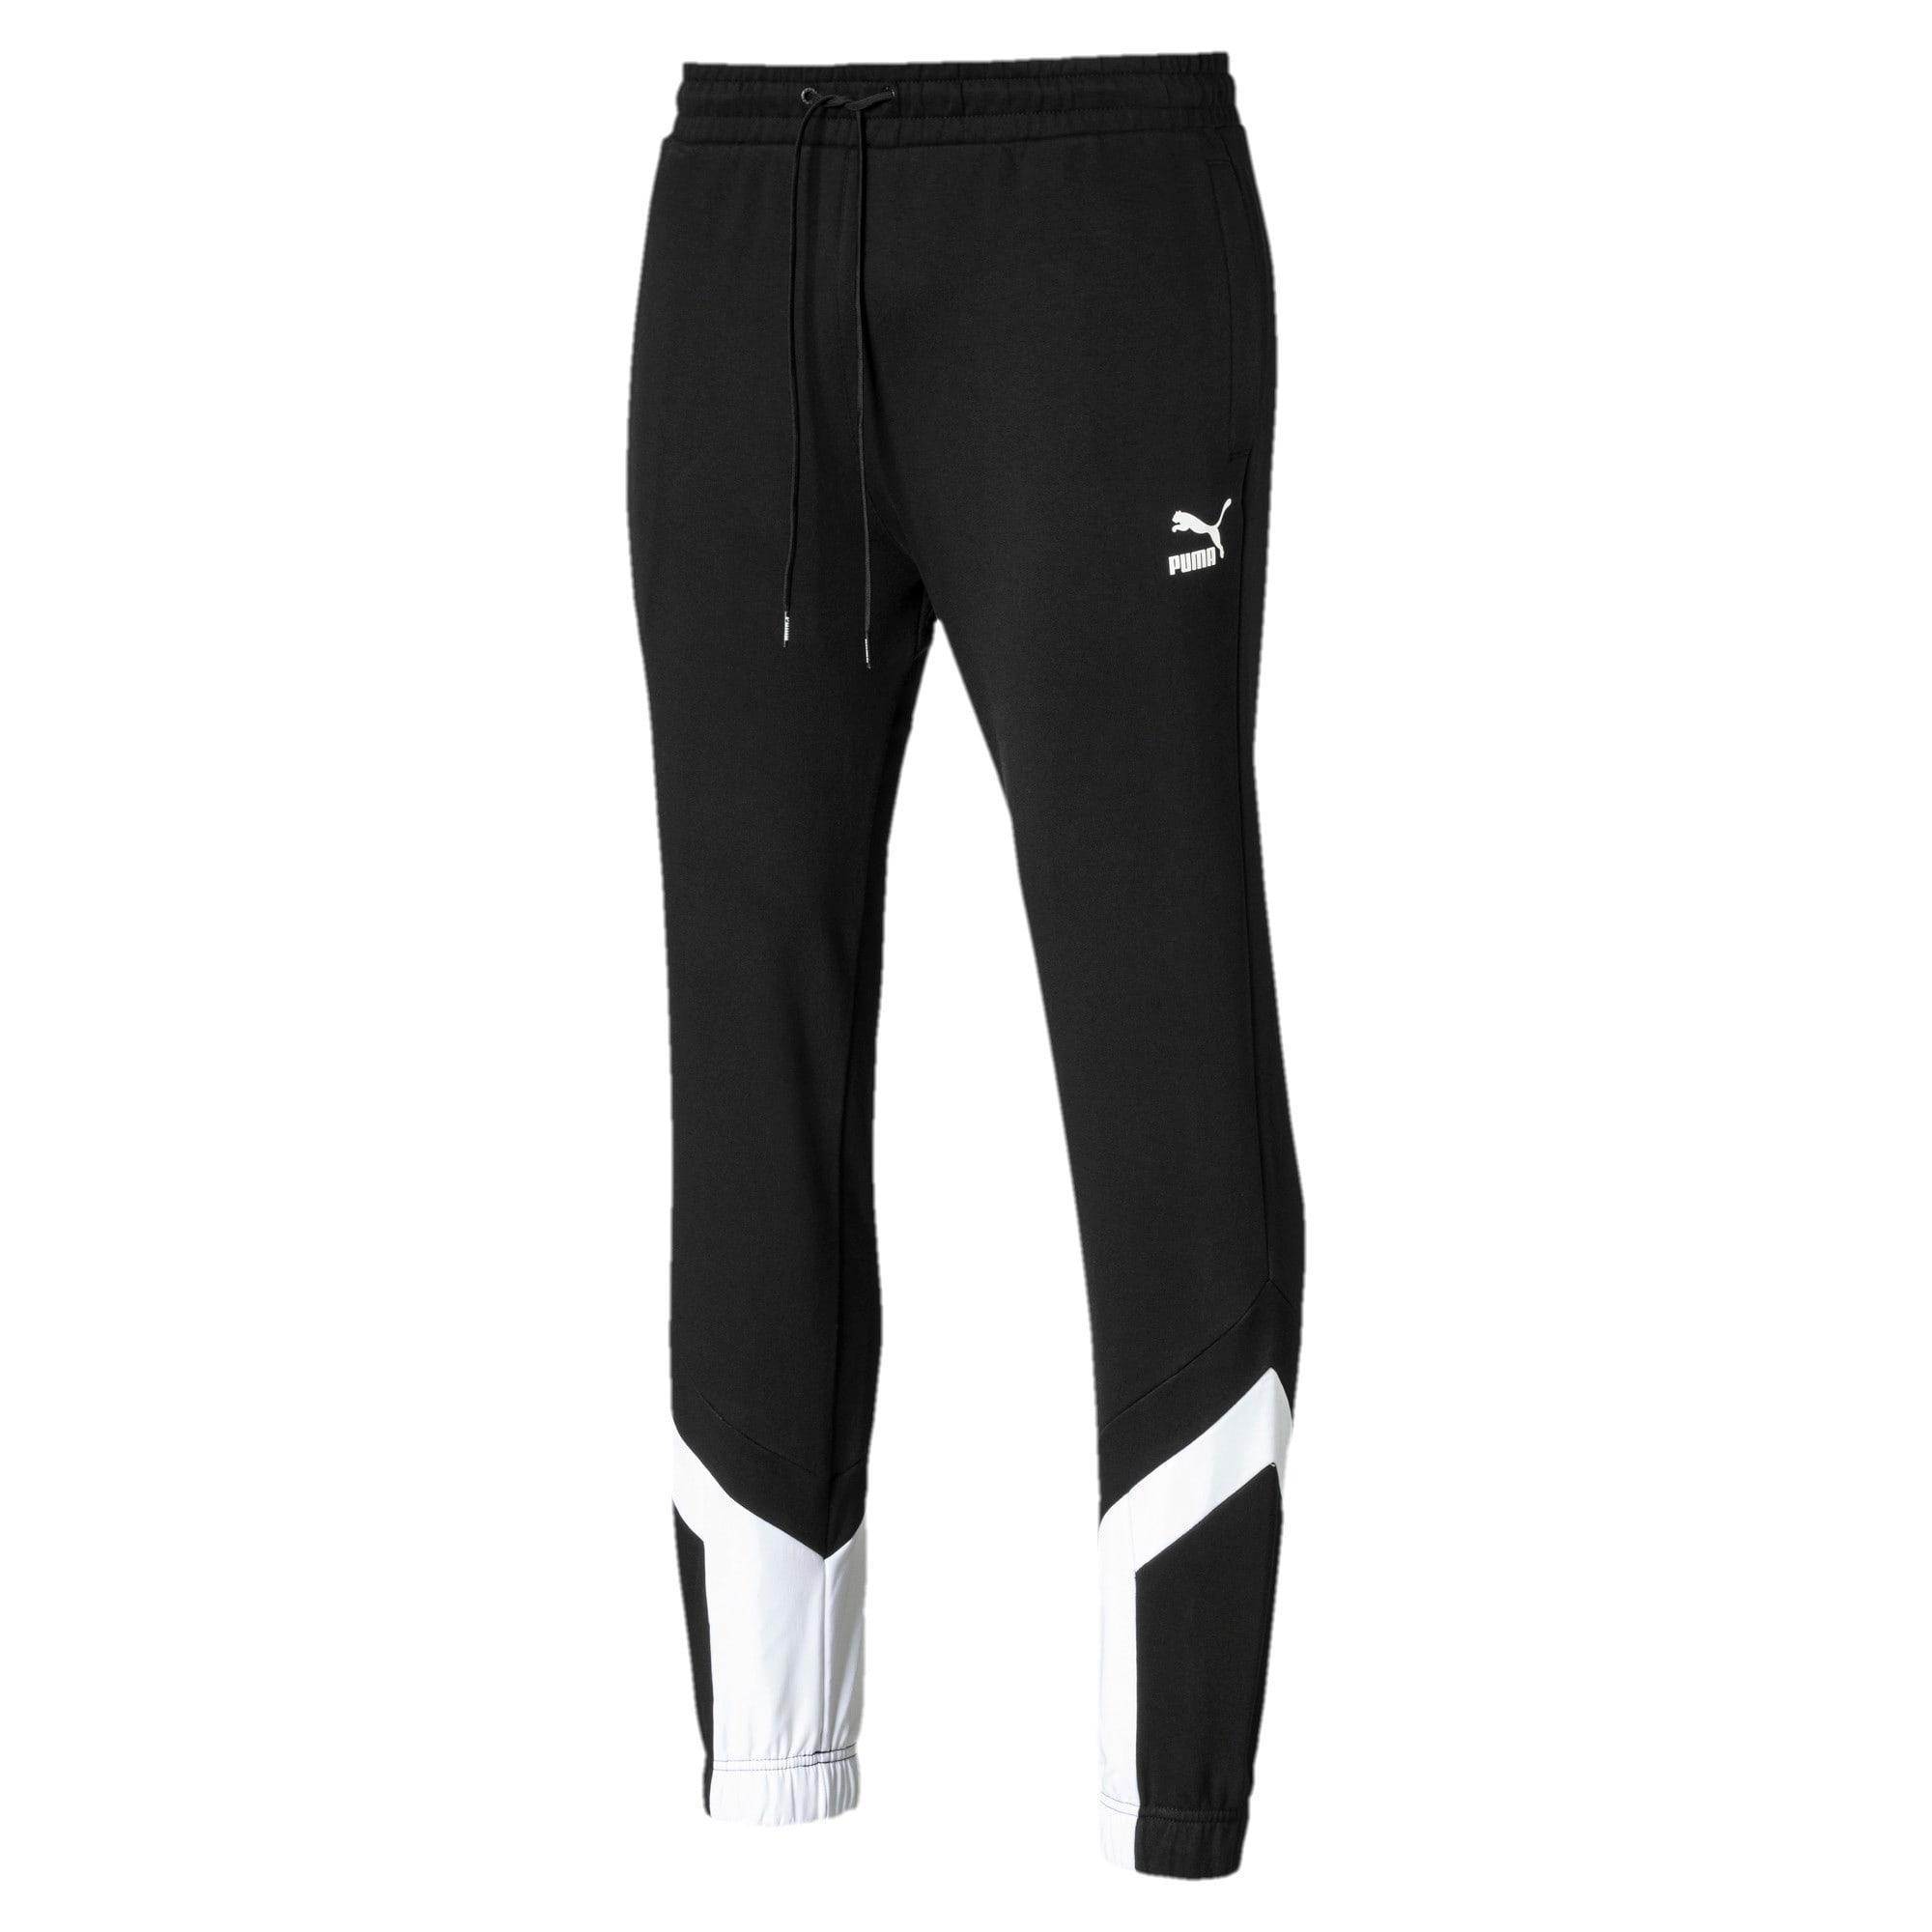 Miniatura 1 de Pantalones deportivos Iconic MCS de hombre, Puma Black, mediano